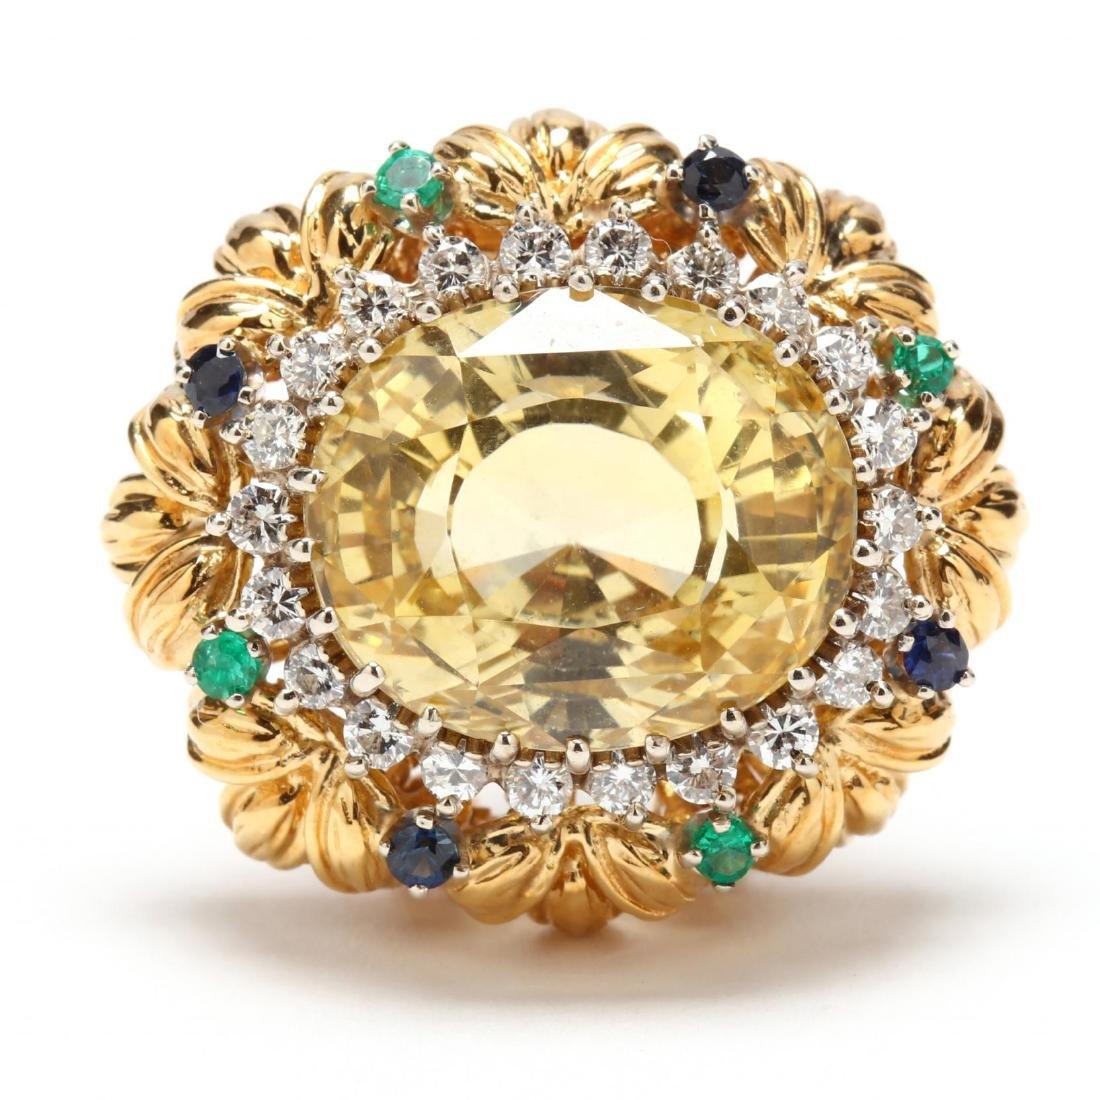 18KT Gold, Ceylon Yellow Sapphire, Diamond, Emerald,